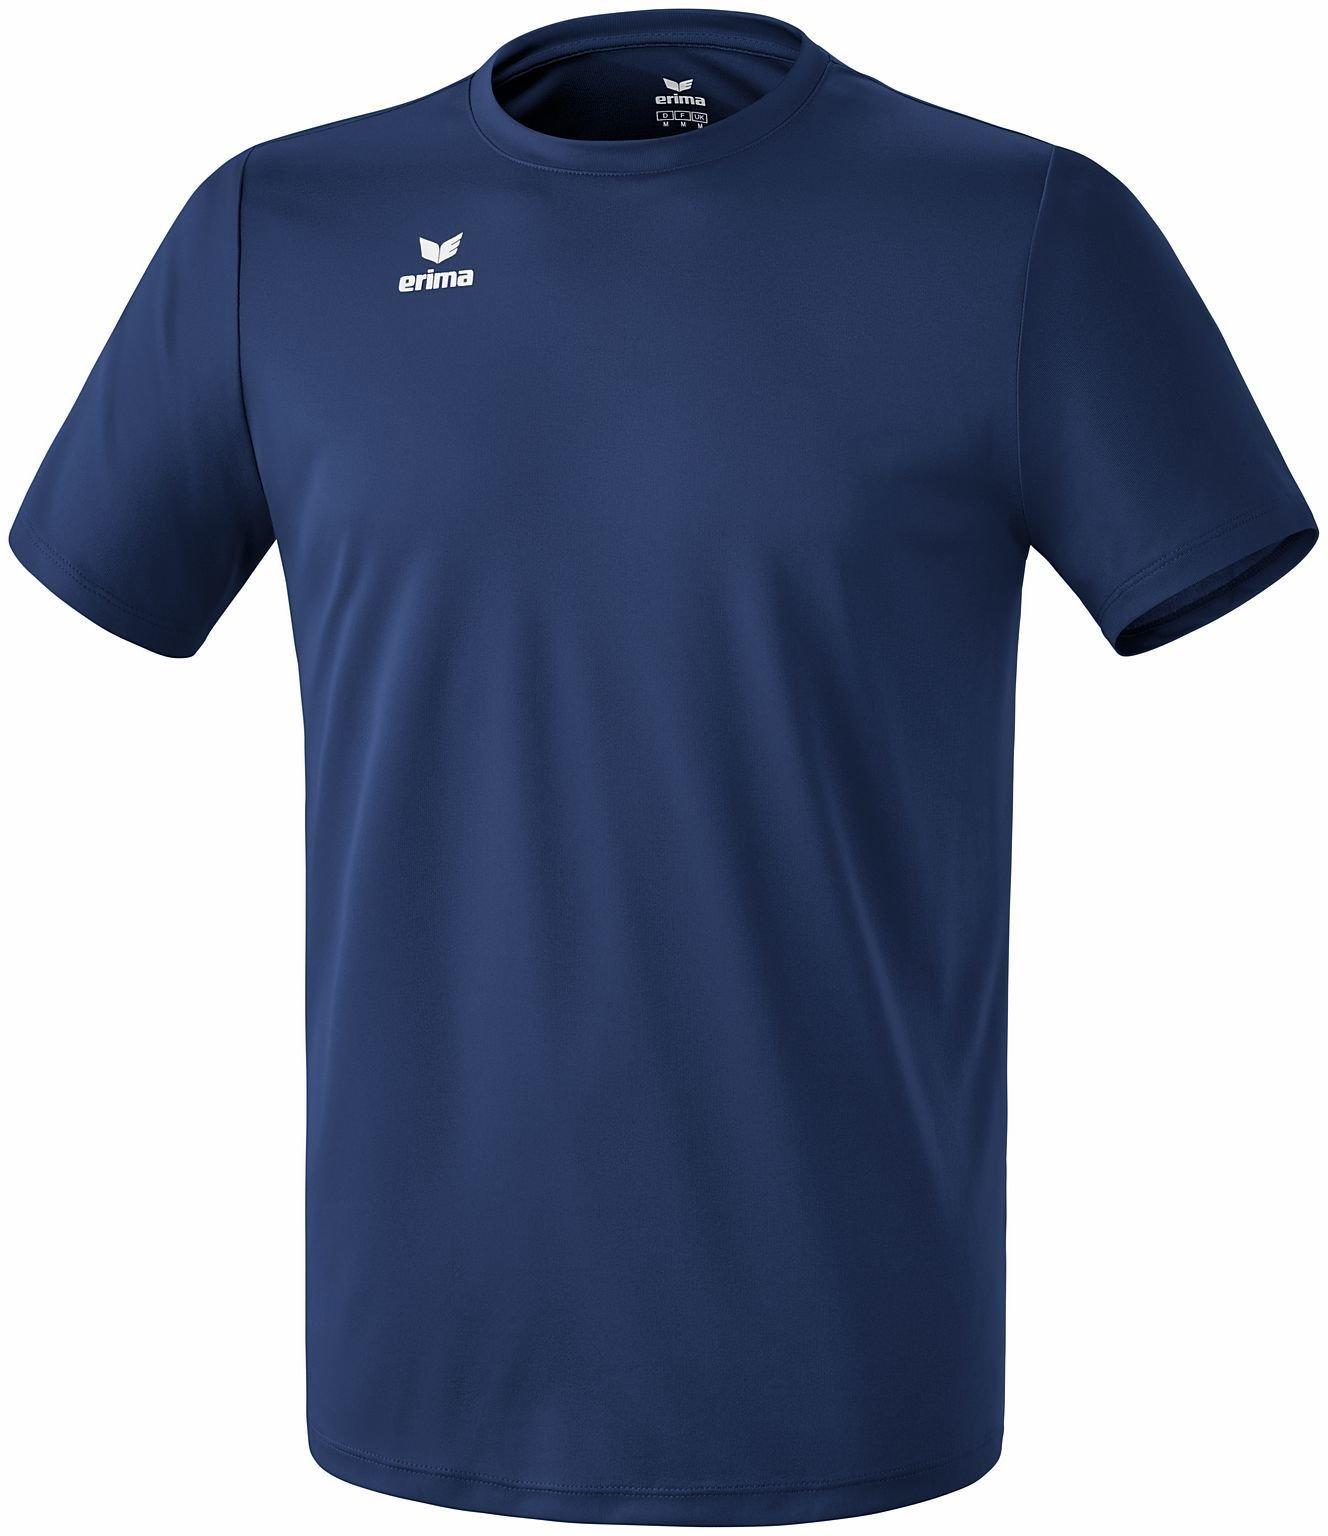 Funktion T-Shirt Herren